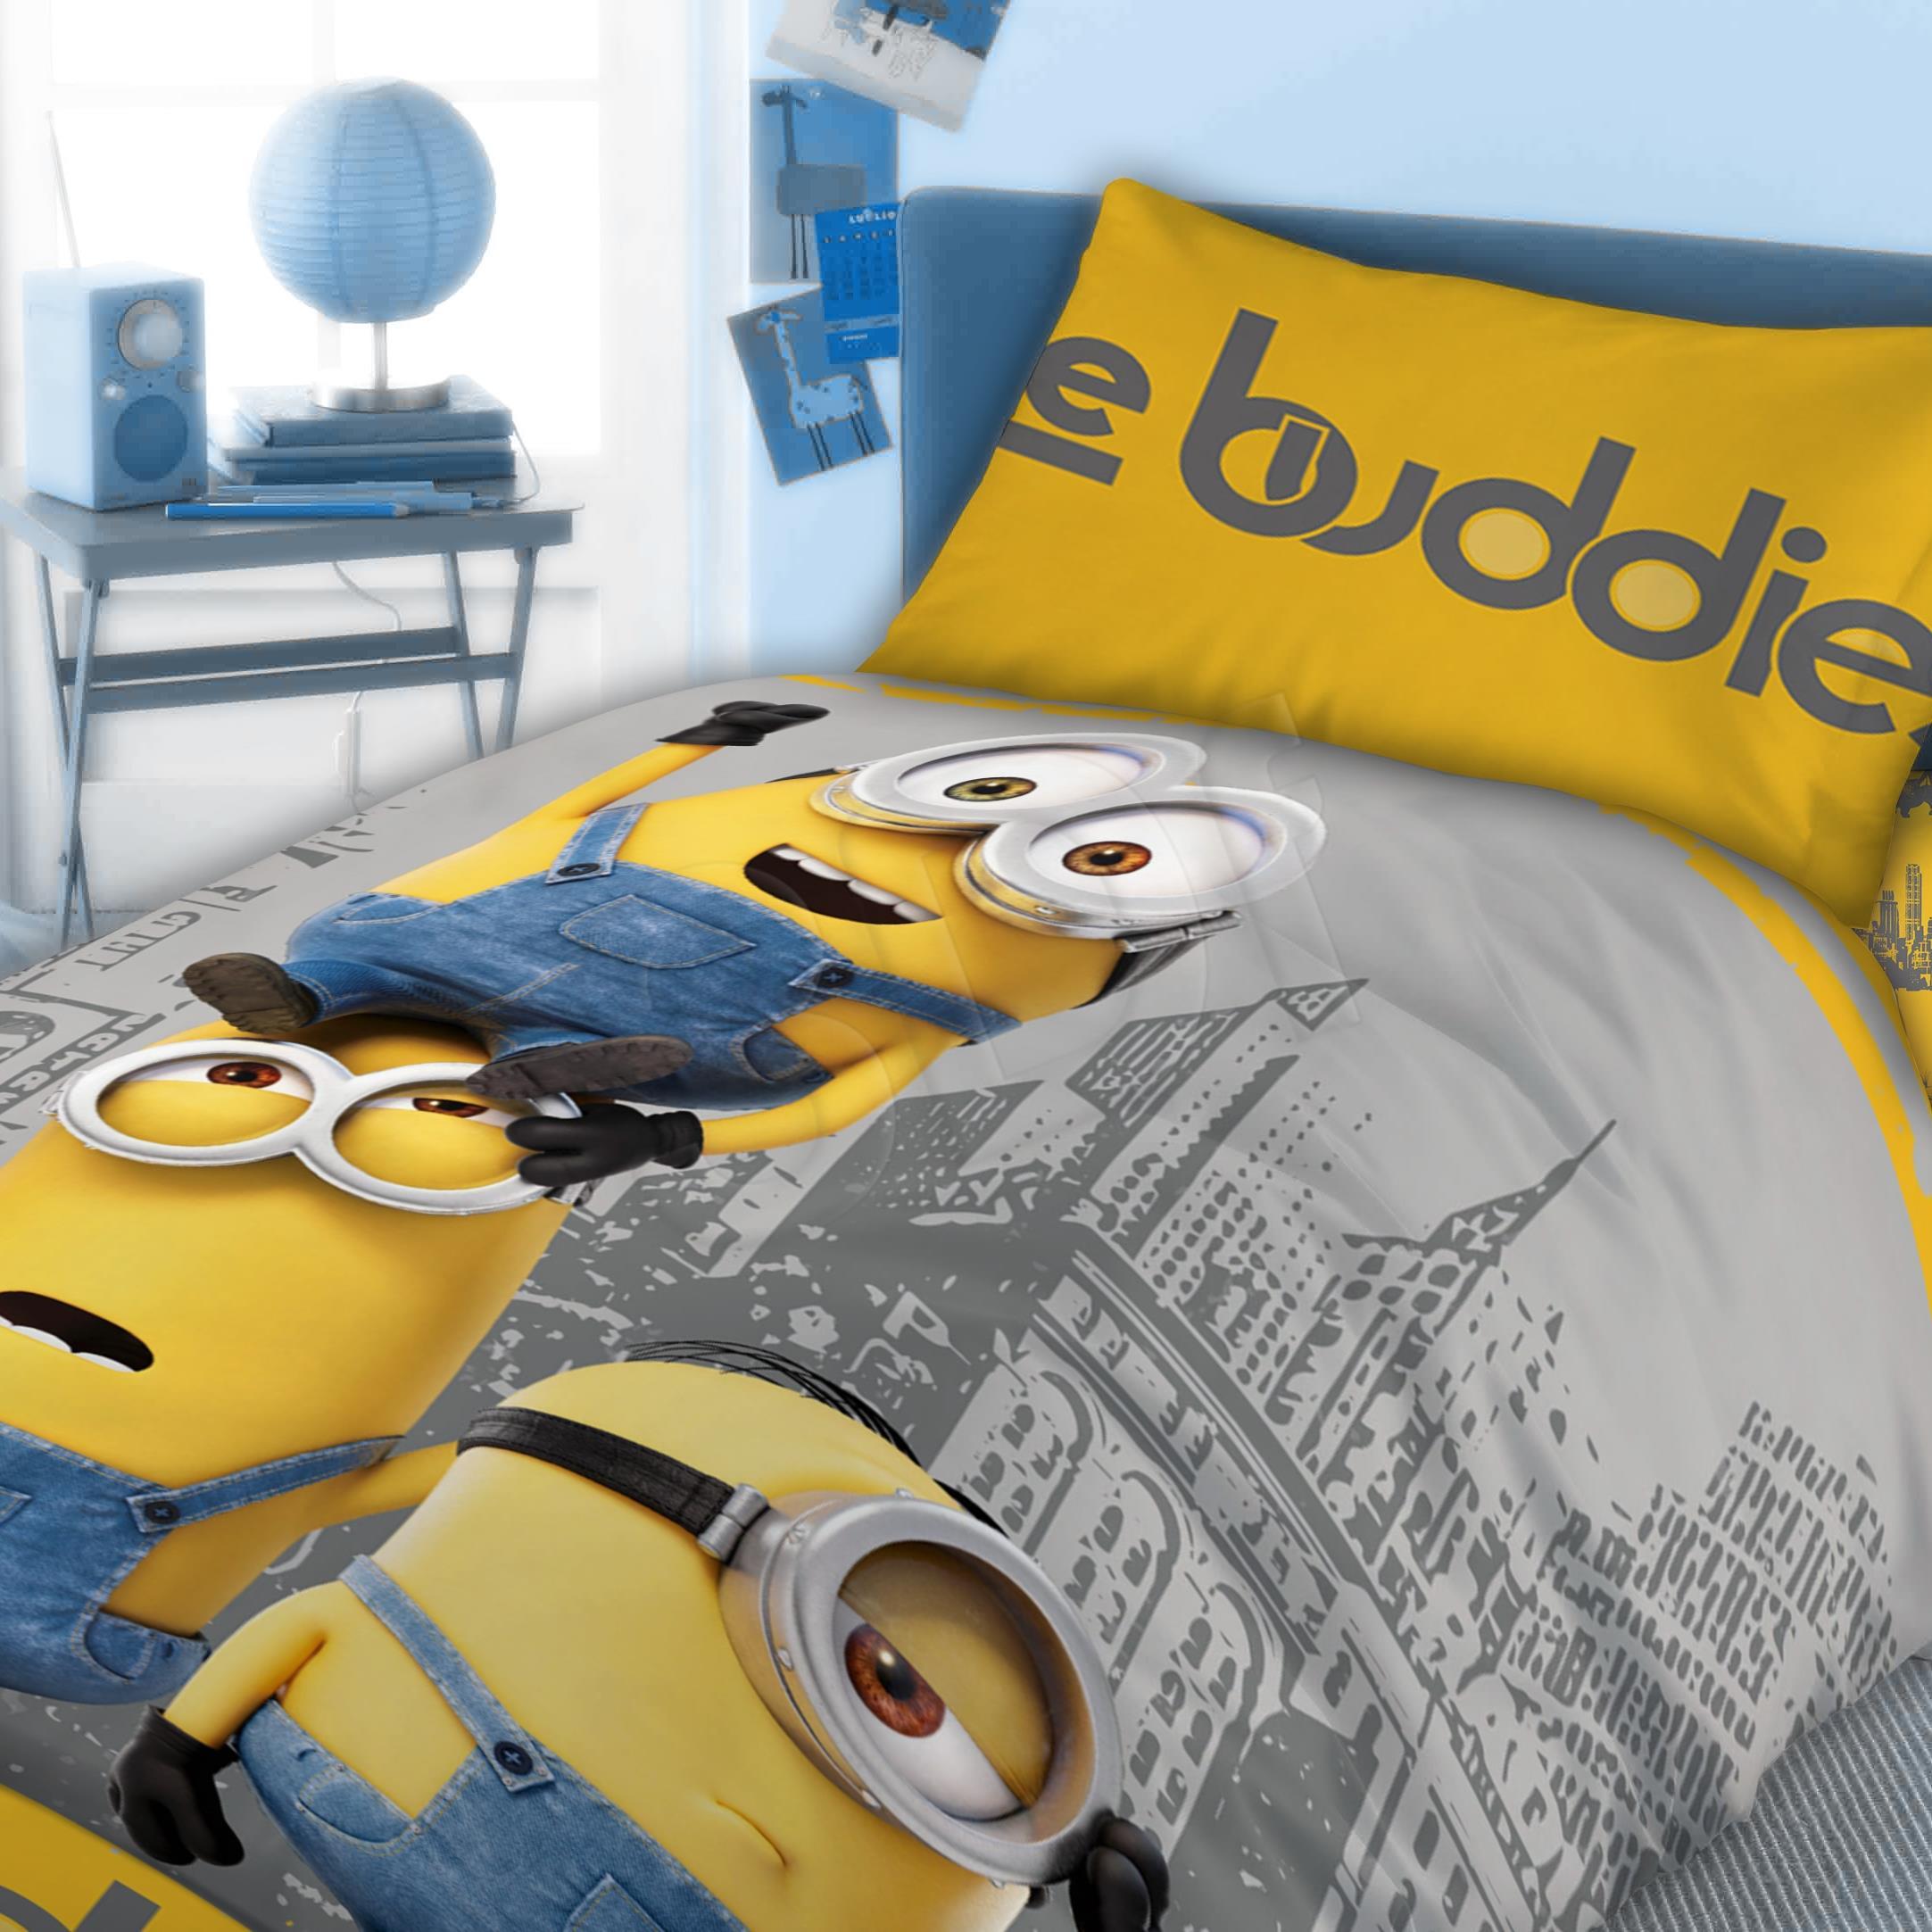 Bed linen Faro  FAO067 (140x200 cm, 70x90 cm; blue color, gray color, yellow color) FAO067 Gultas veļa